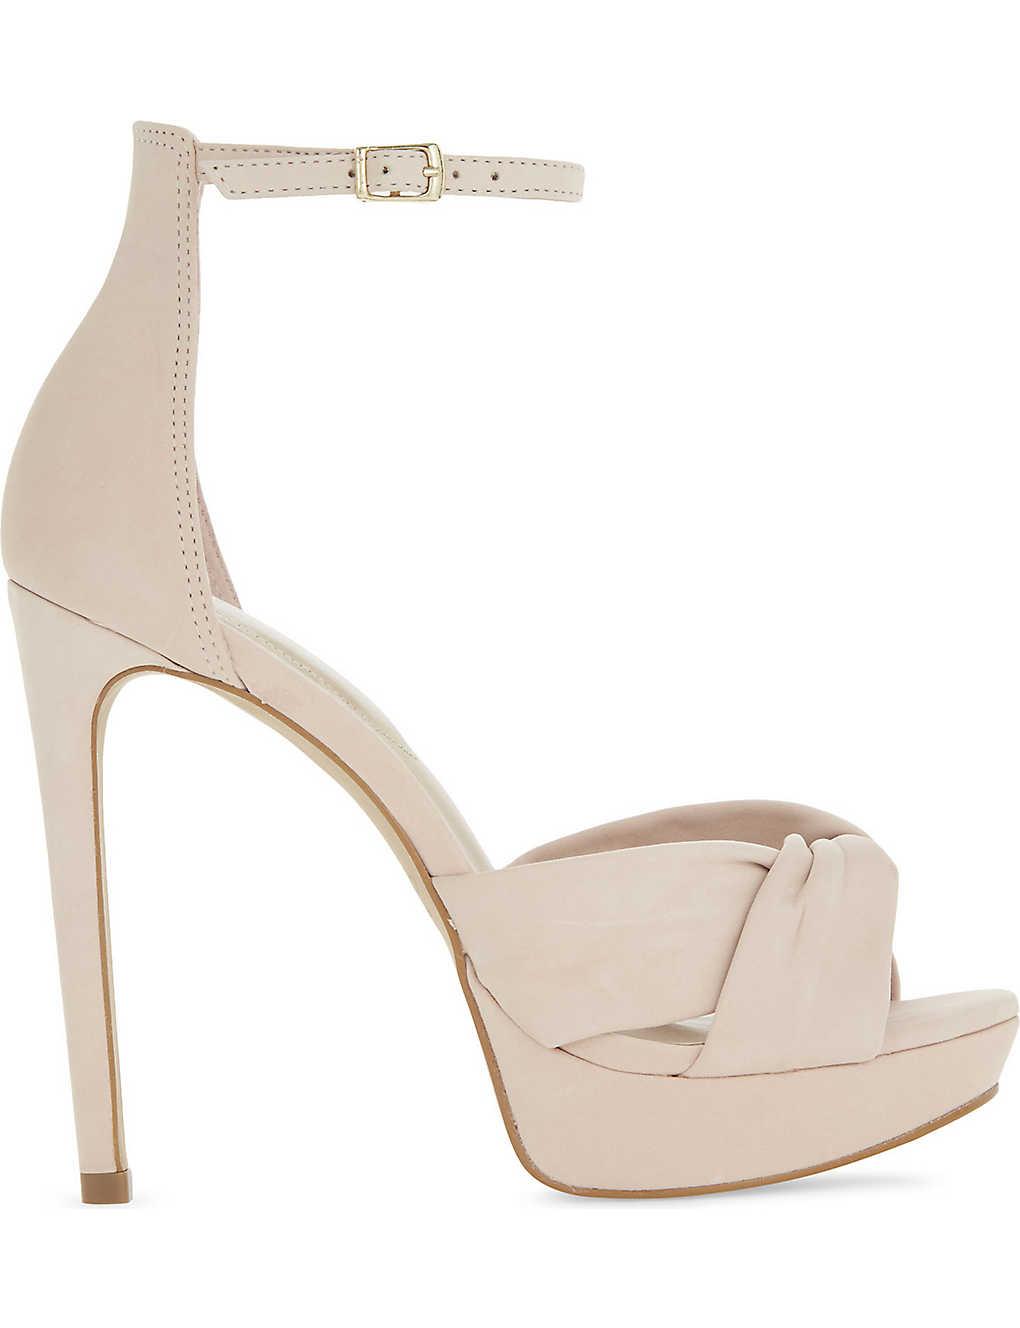 bfda99fde80 ALDO - Ameline leather heeled sandals